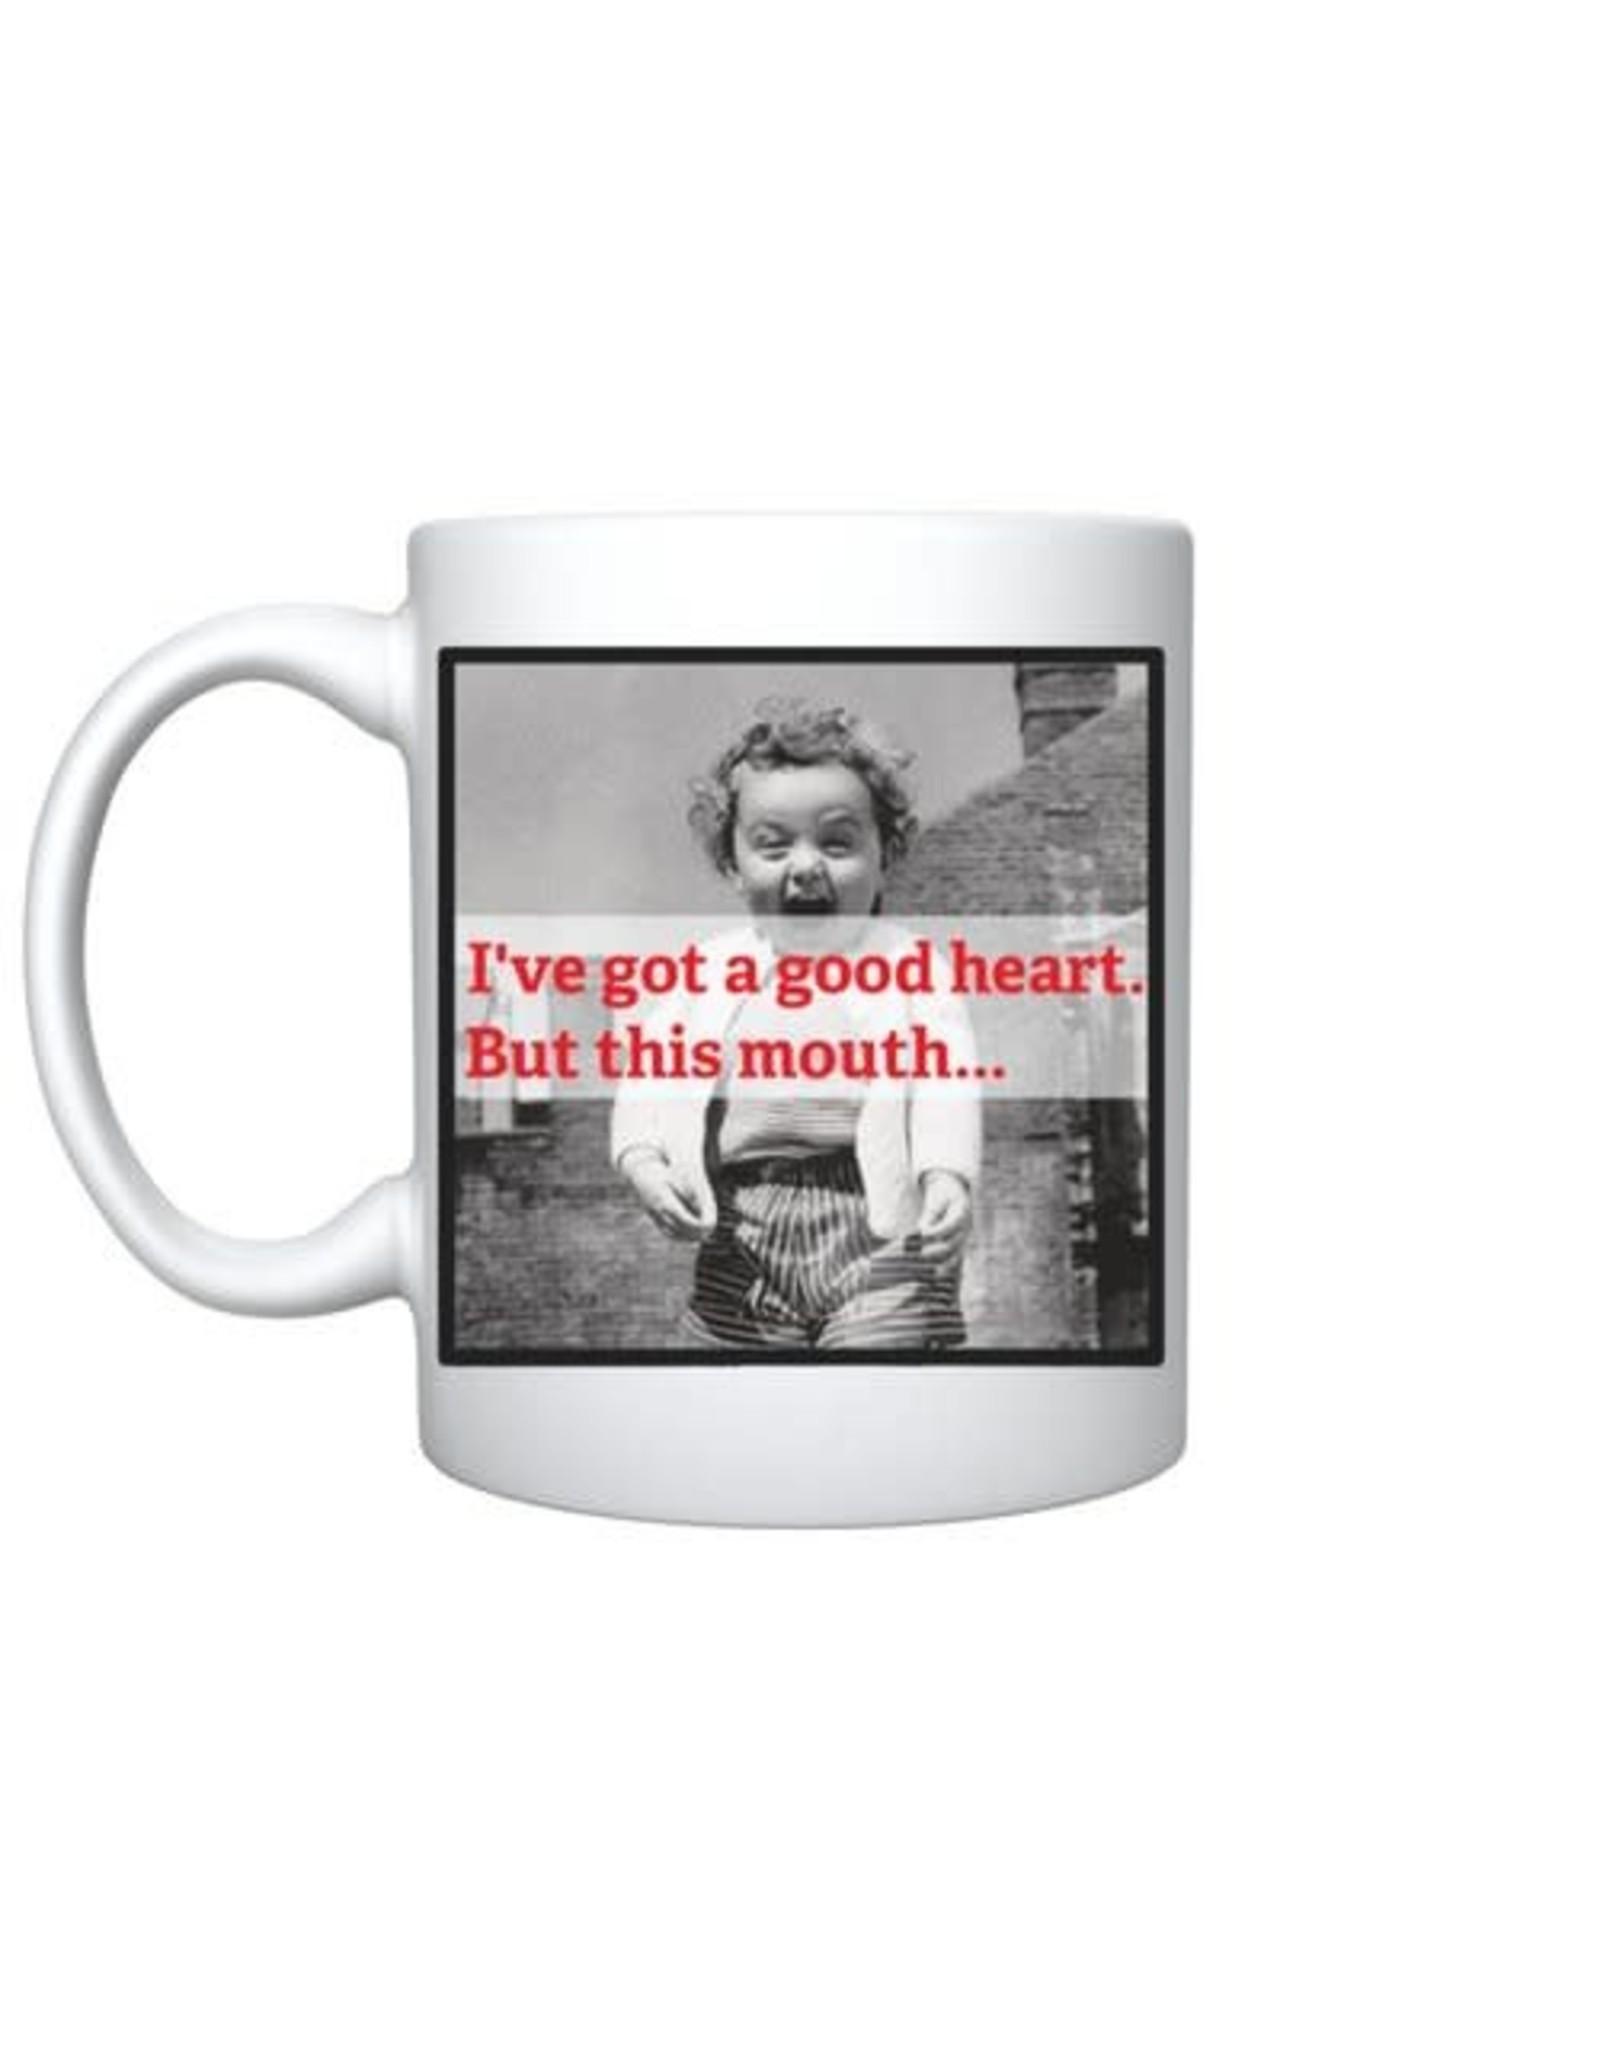 Mug - Got A Good Heart, But This Mouth